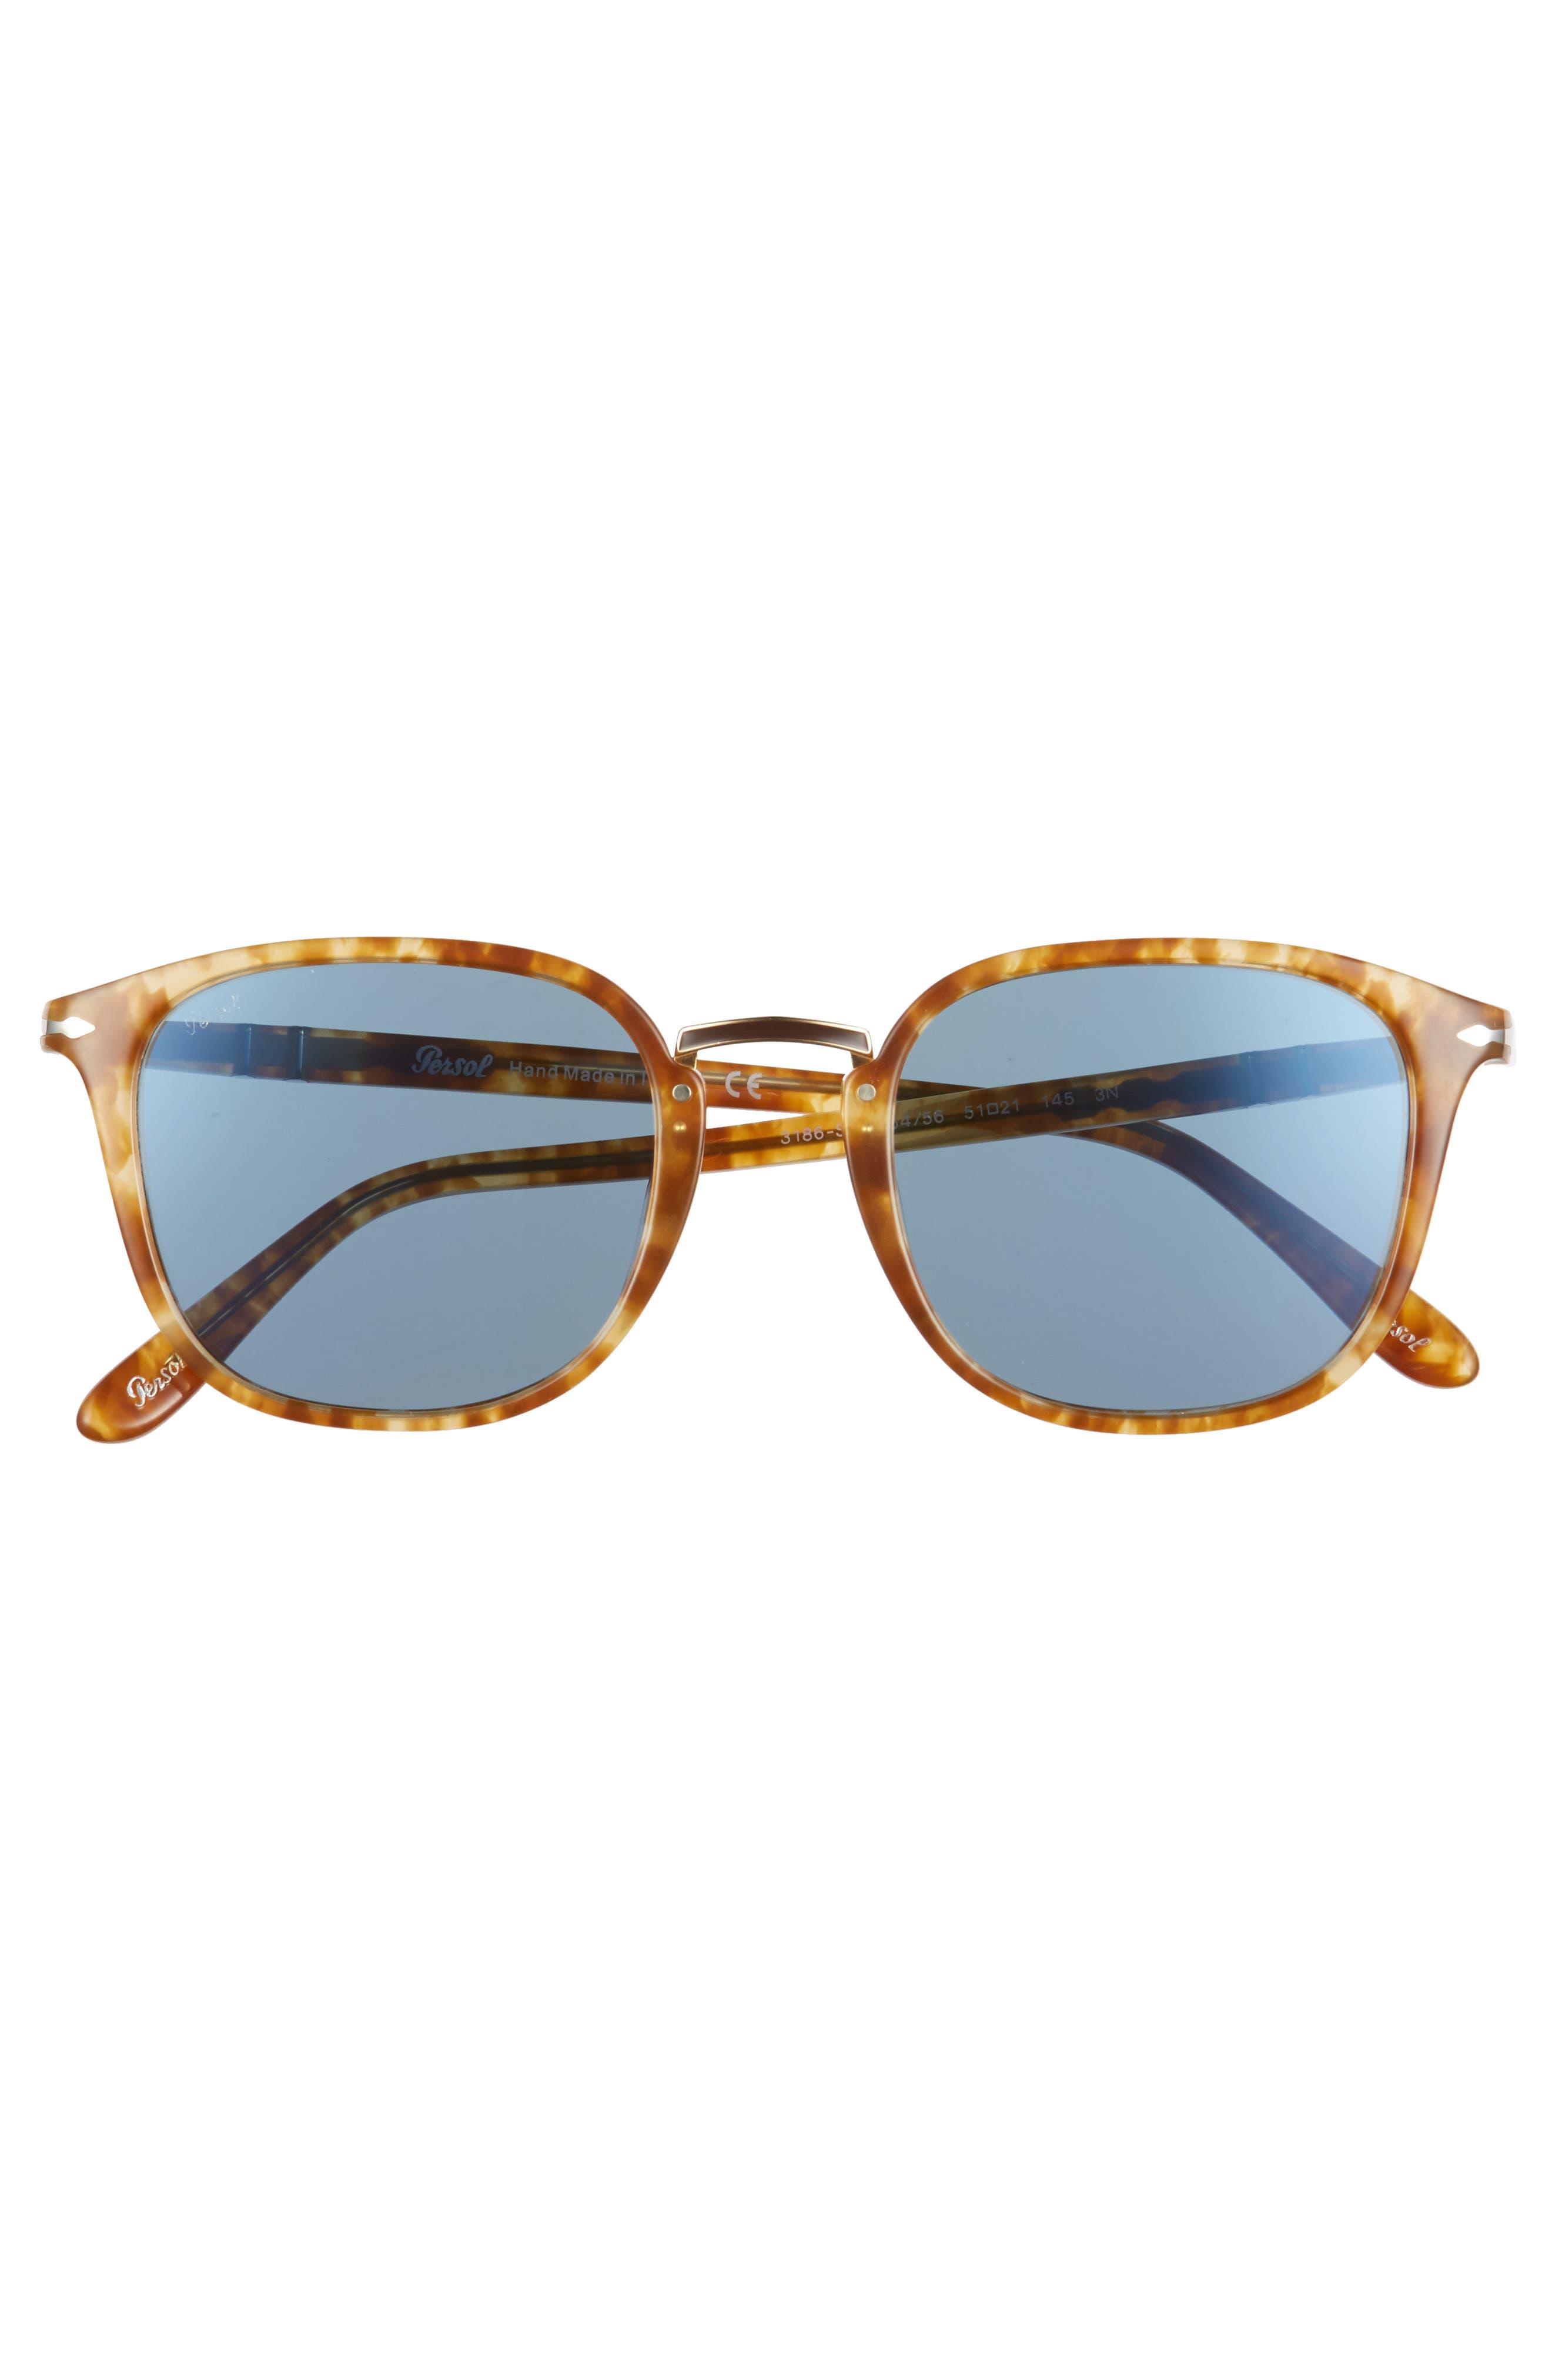 Phantos 51mm Crystal Lens Sunglasses,                             Alternate thumbnail 2, color,                             Beige Tortoise